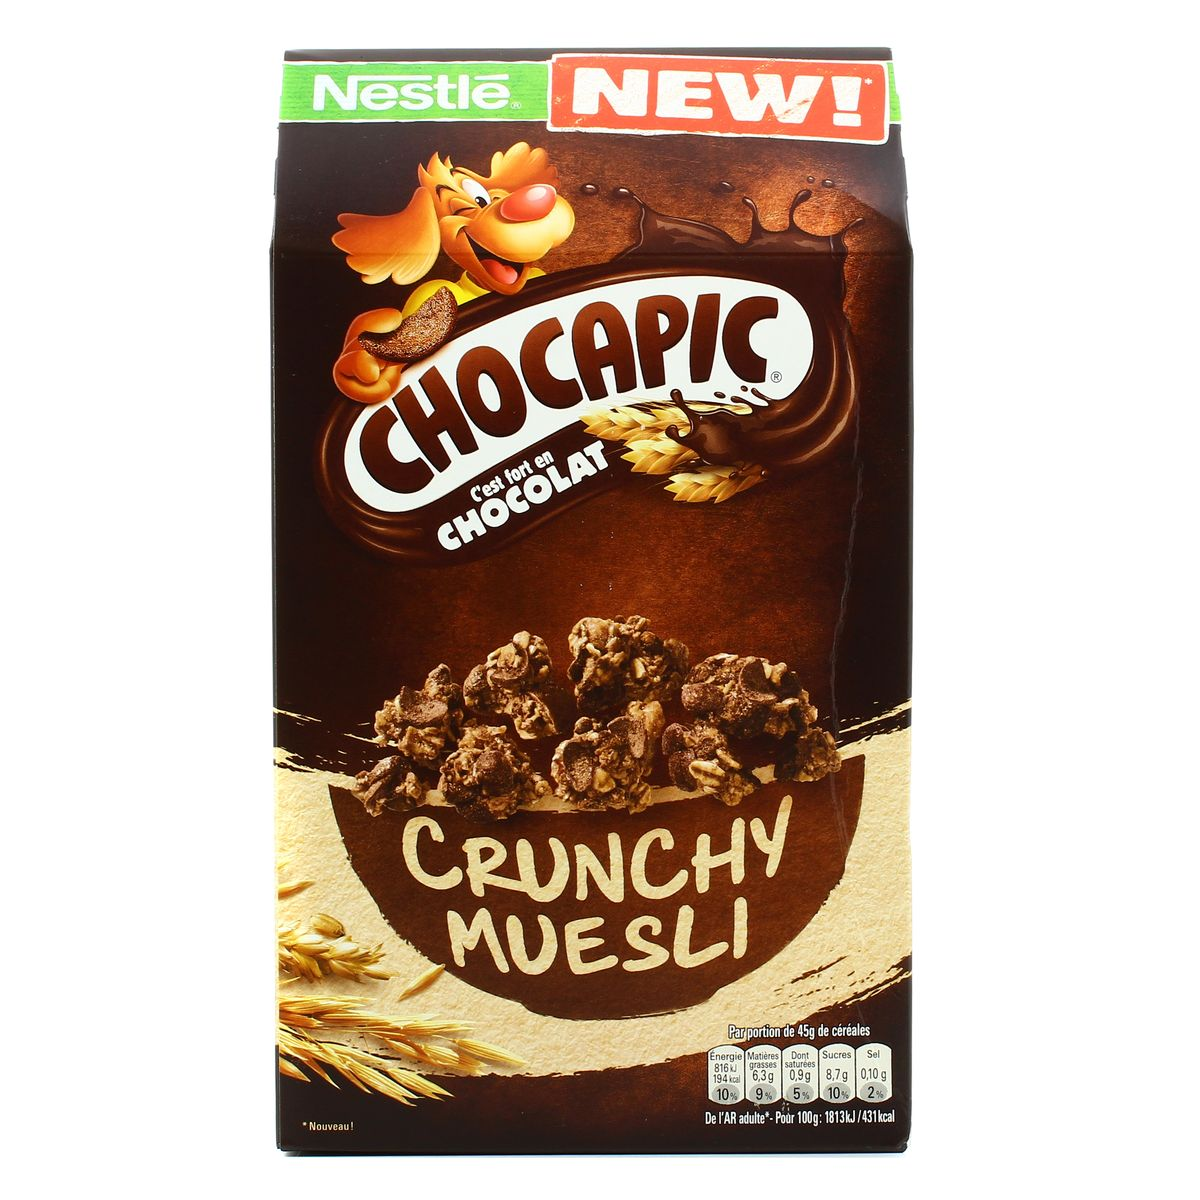 Chocapic Crunchy céreales, Nestle (420 g)